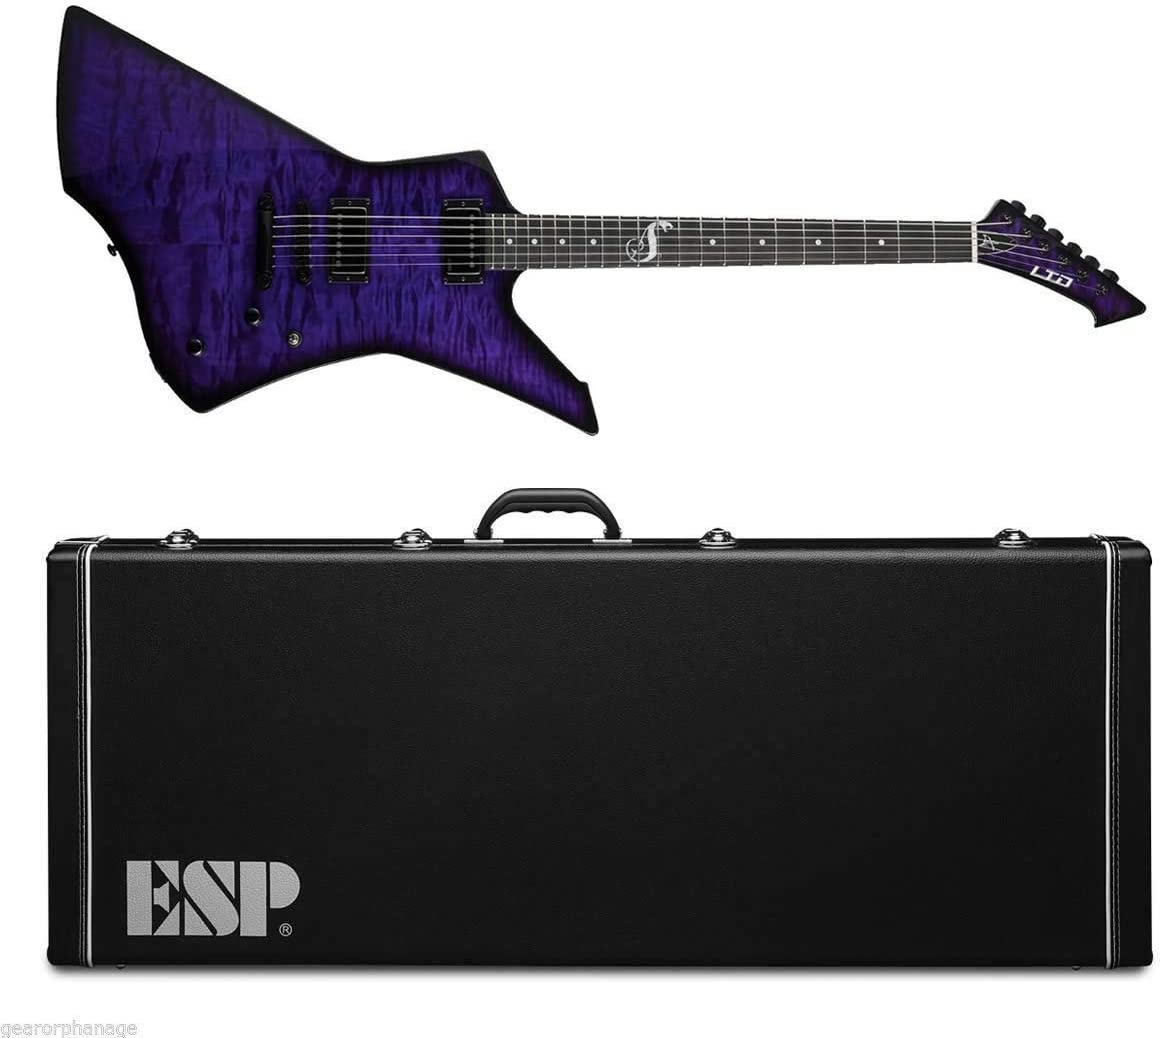 ESP Guitarra Eléctica Snakebyte Baritone SE Purple Limited Edition ...